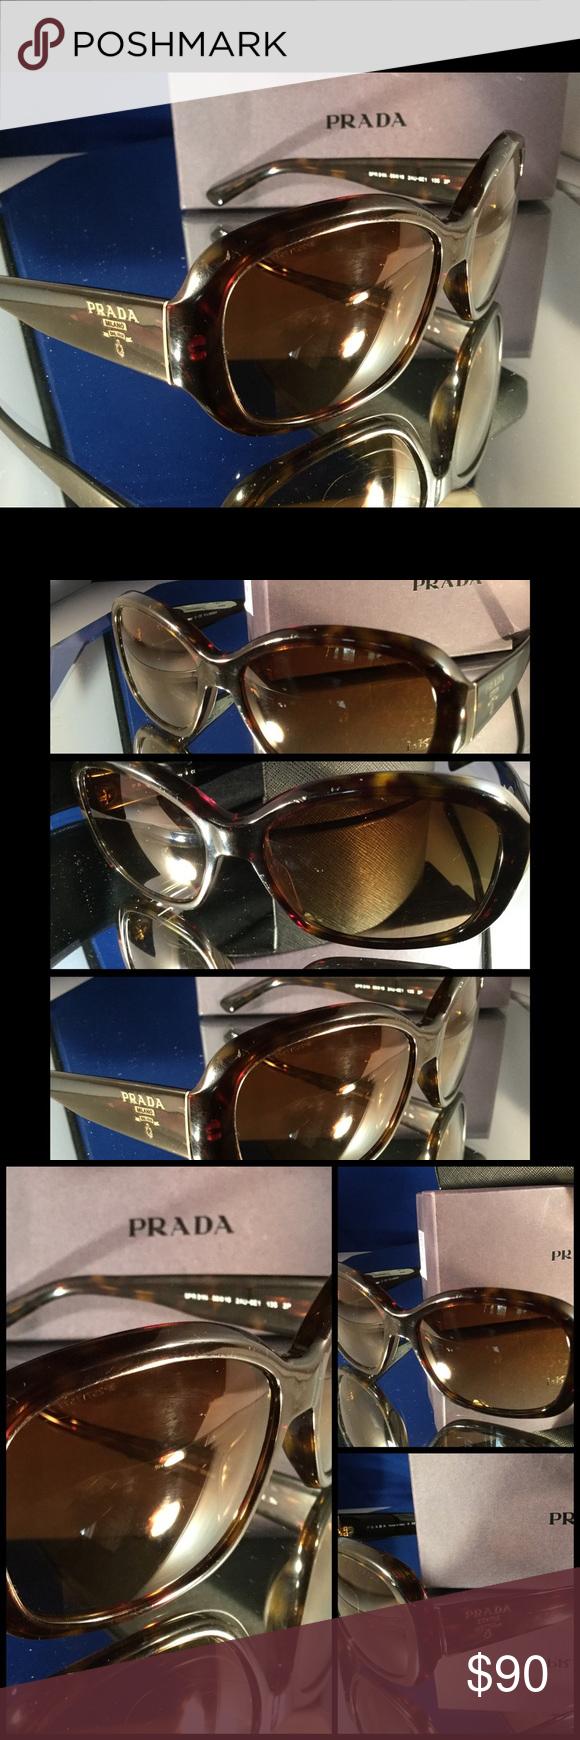 743b1804f2 PRADA Polarized Havana Dark Tortoise Sunglasses  6 Unisex classic